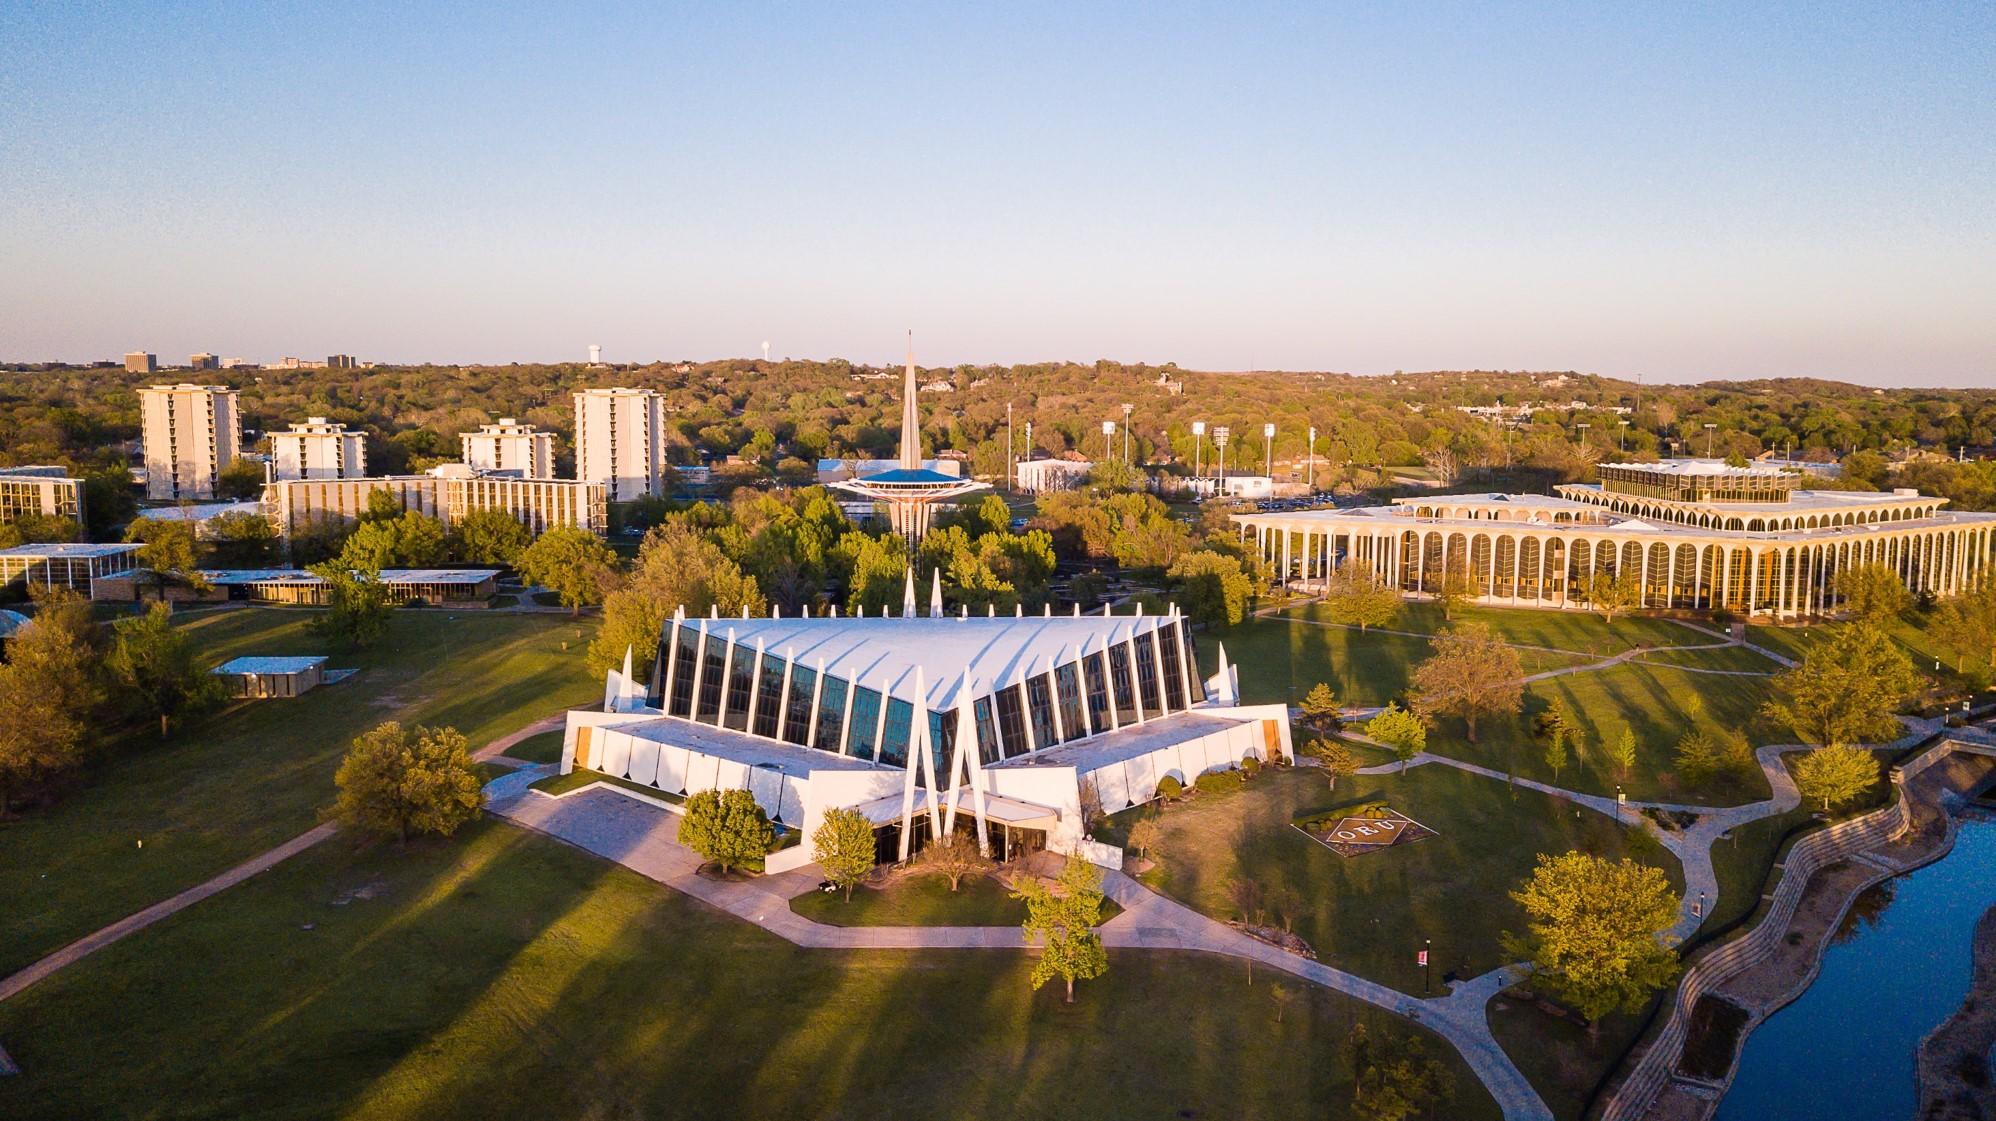 ORU Campus